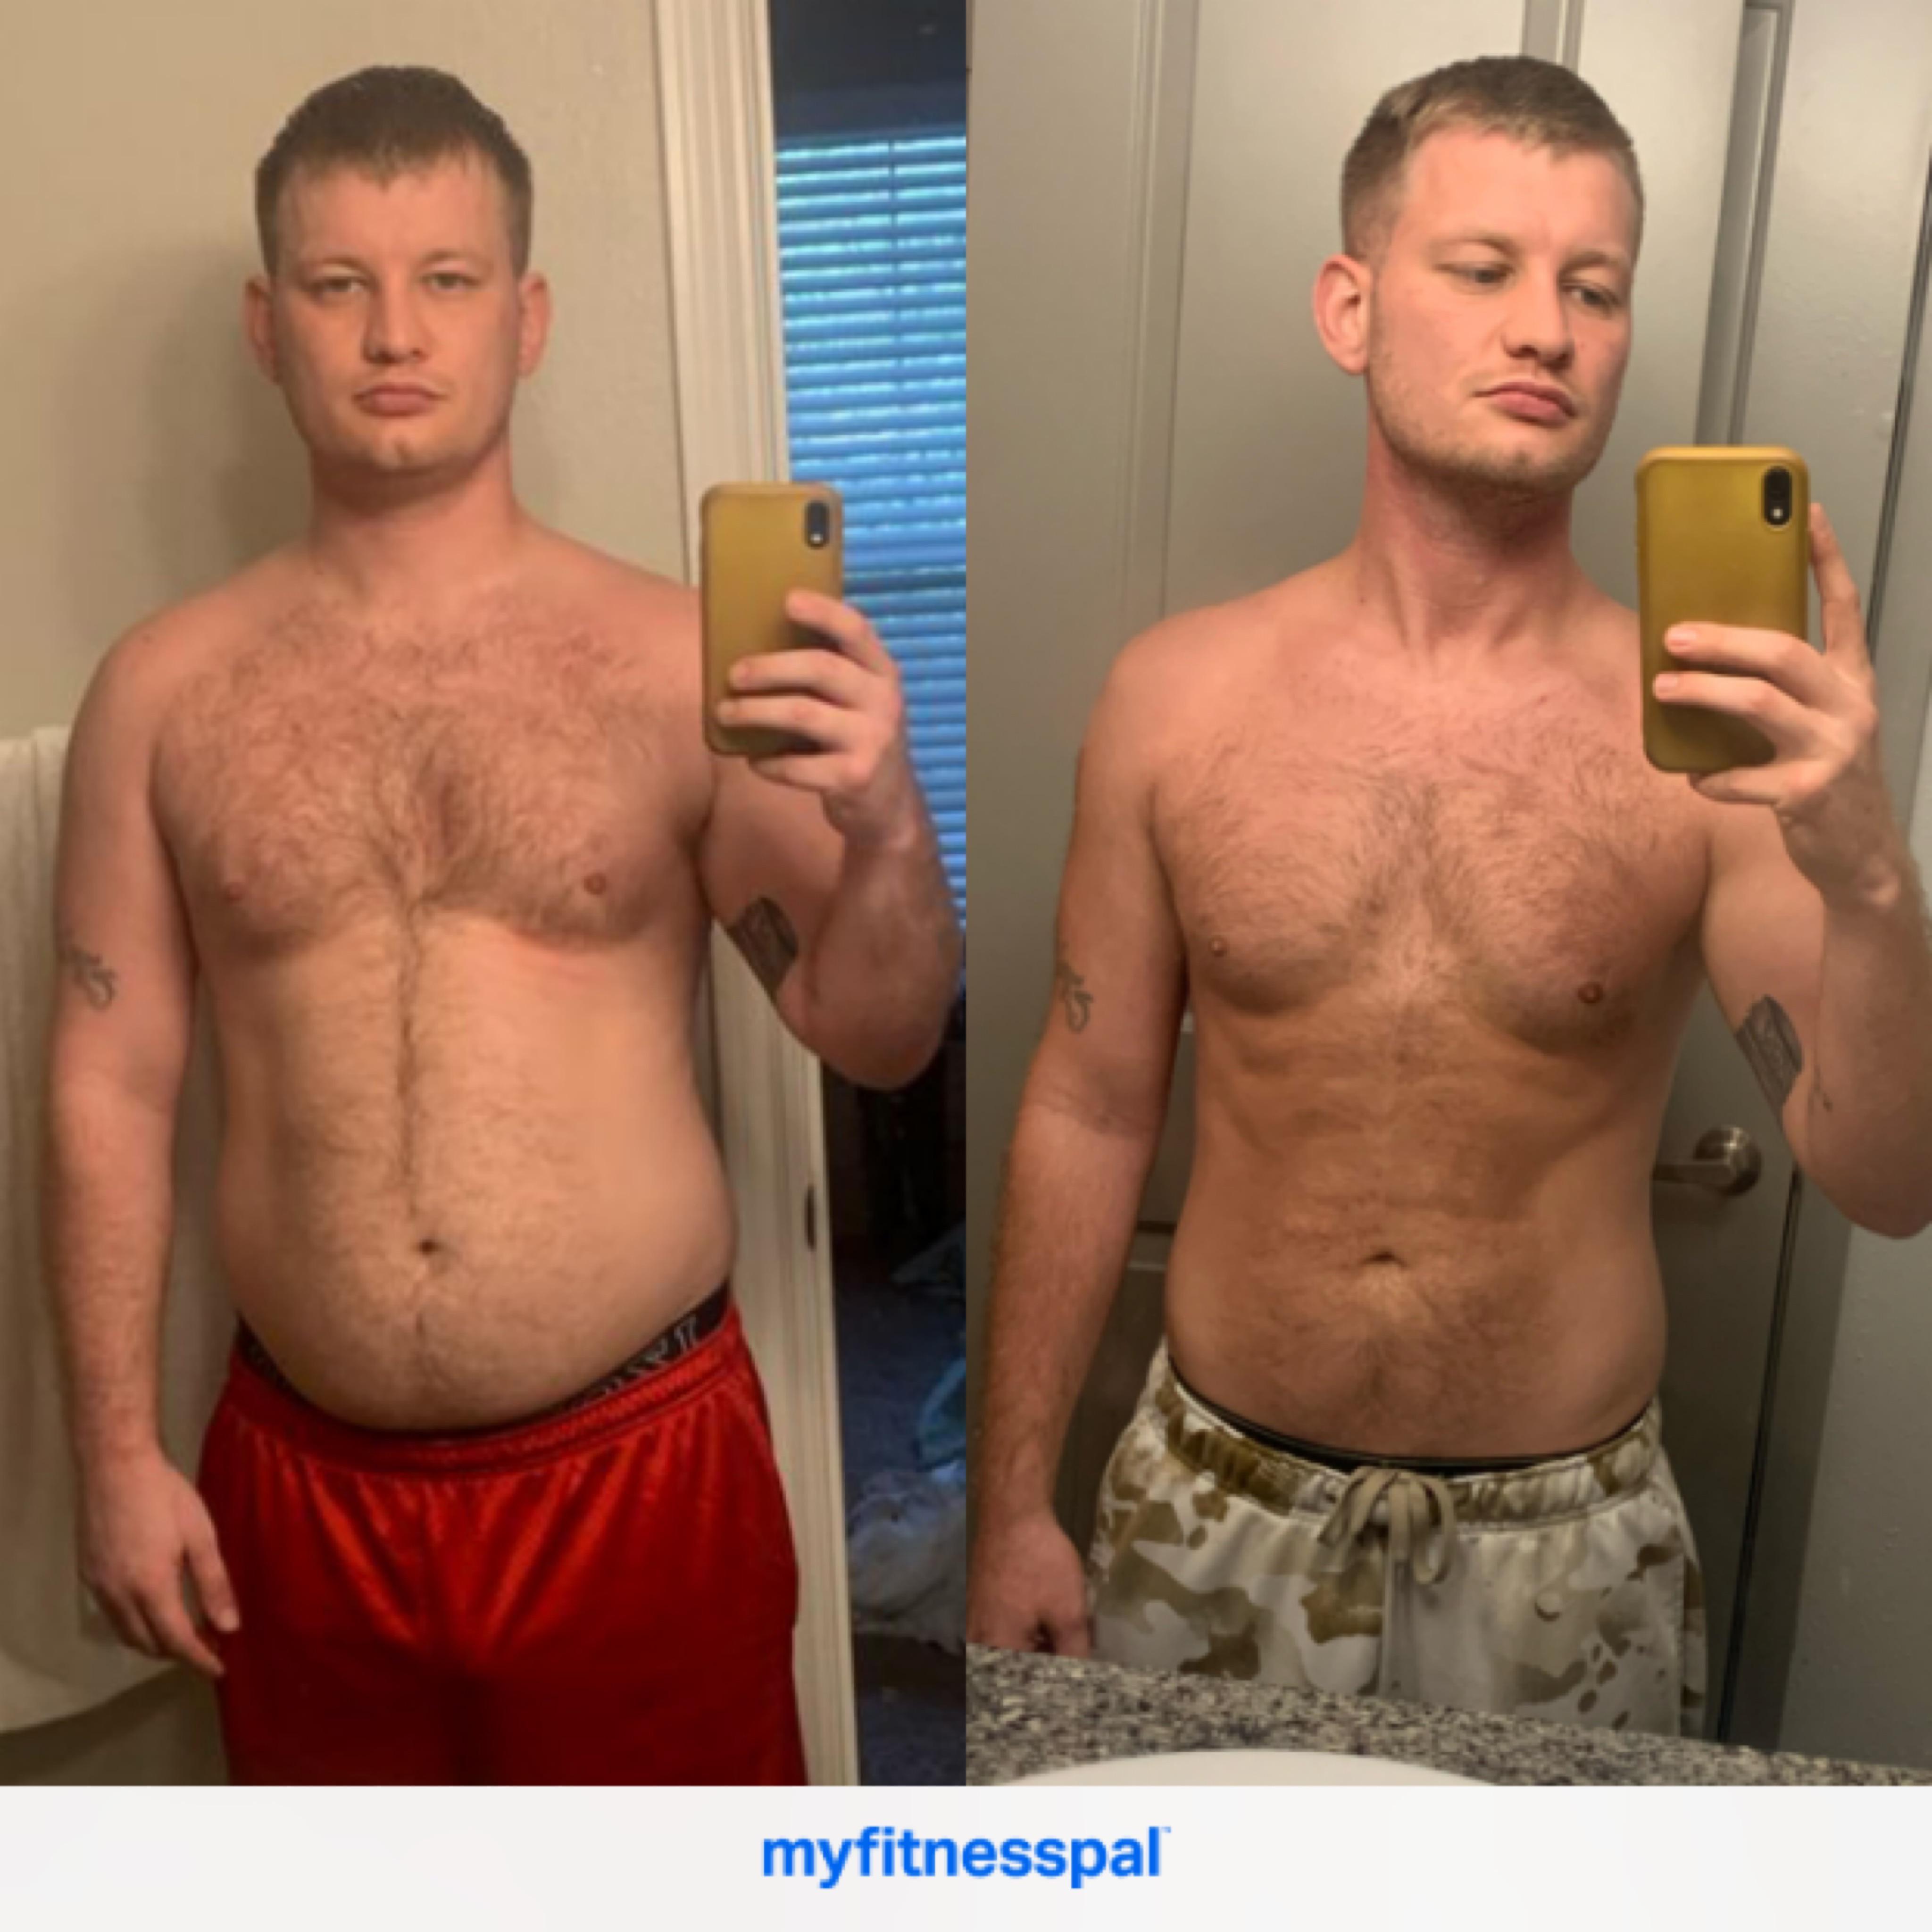 5 foot 10 Male 40 lbs Fat Loss 205 lbs to 165 lbs